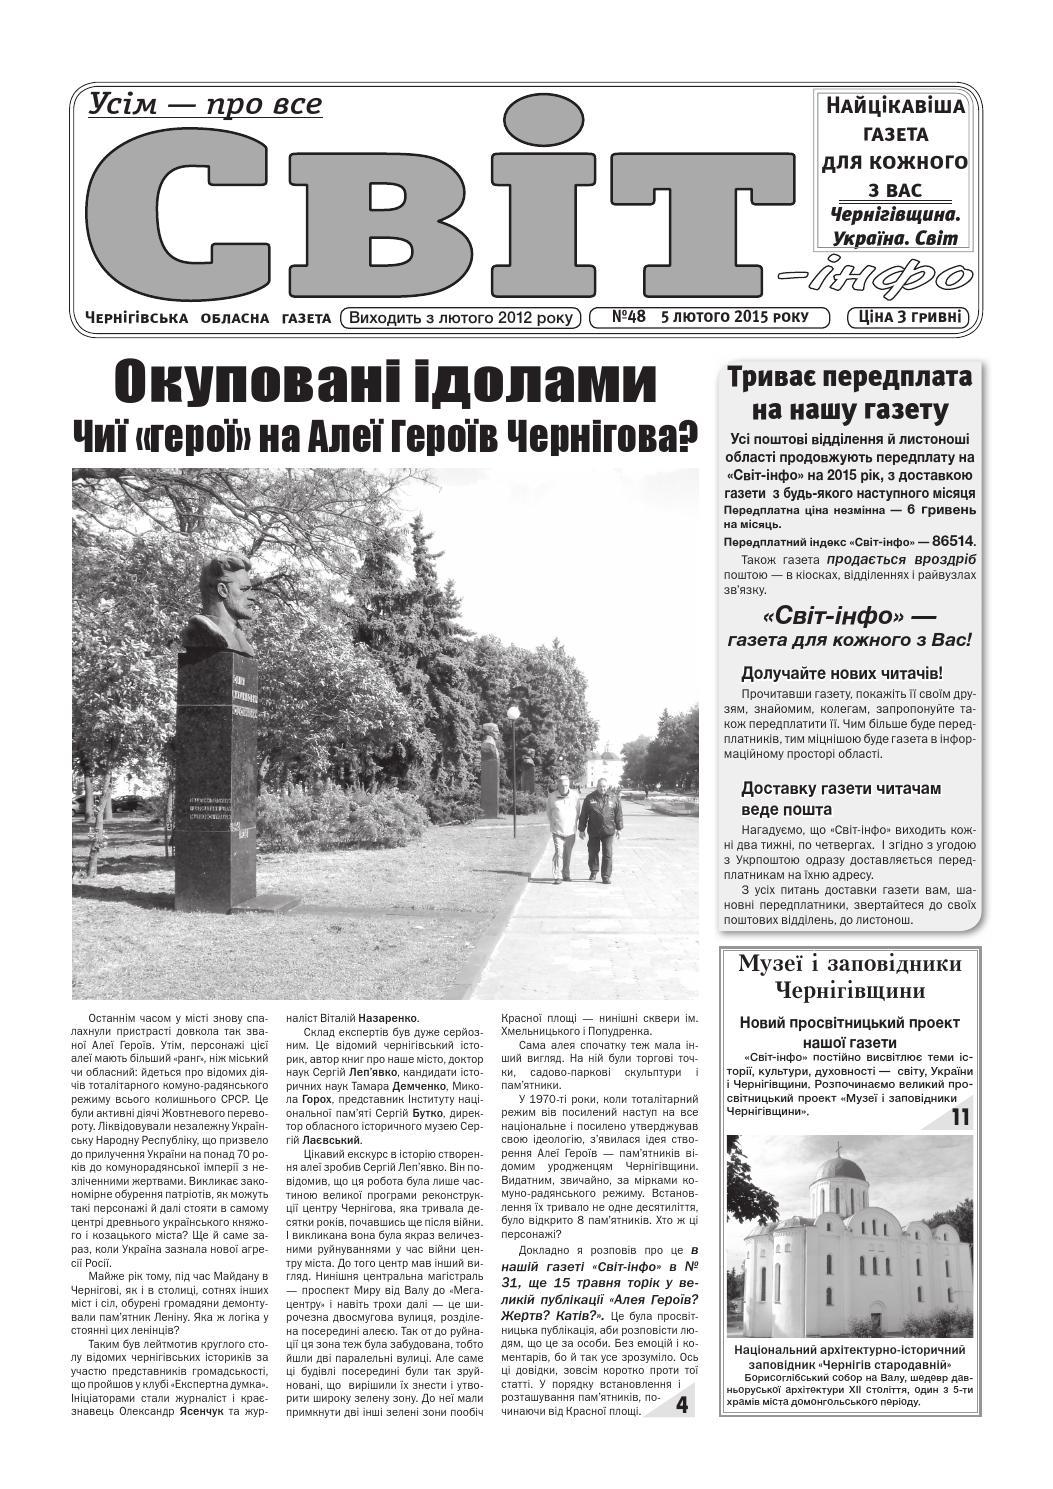 Svit info 48 by Alex Iasenchuk - issuu cabc933529d34